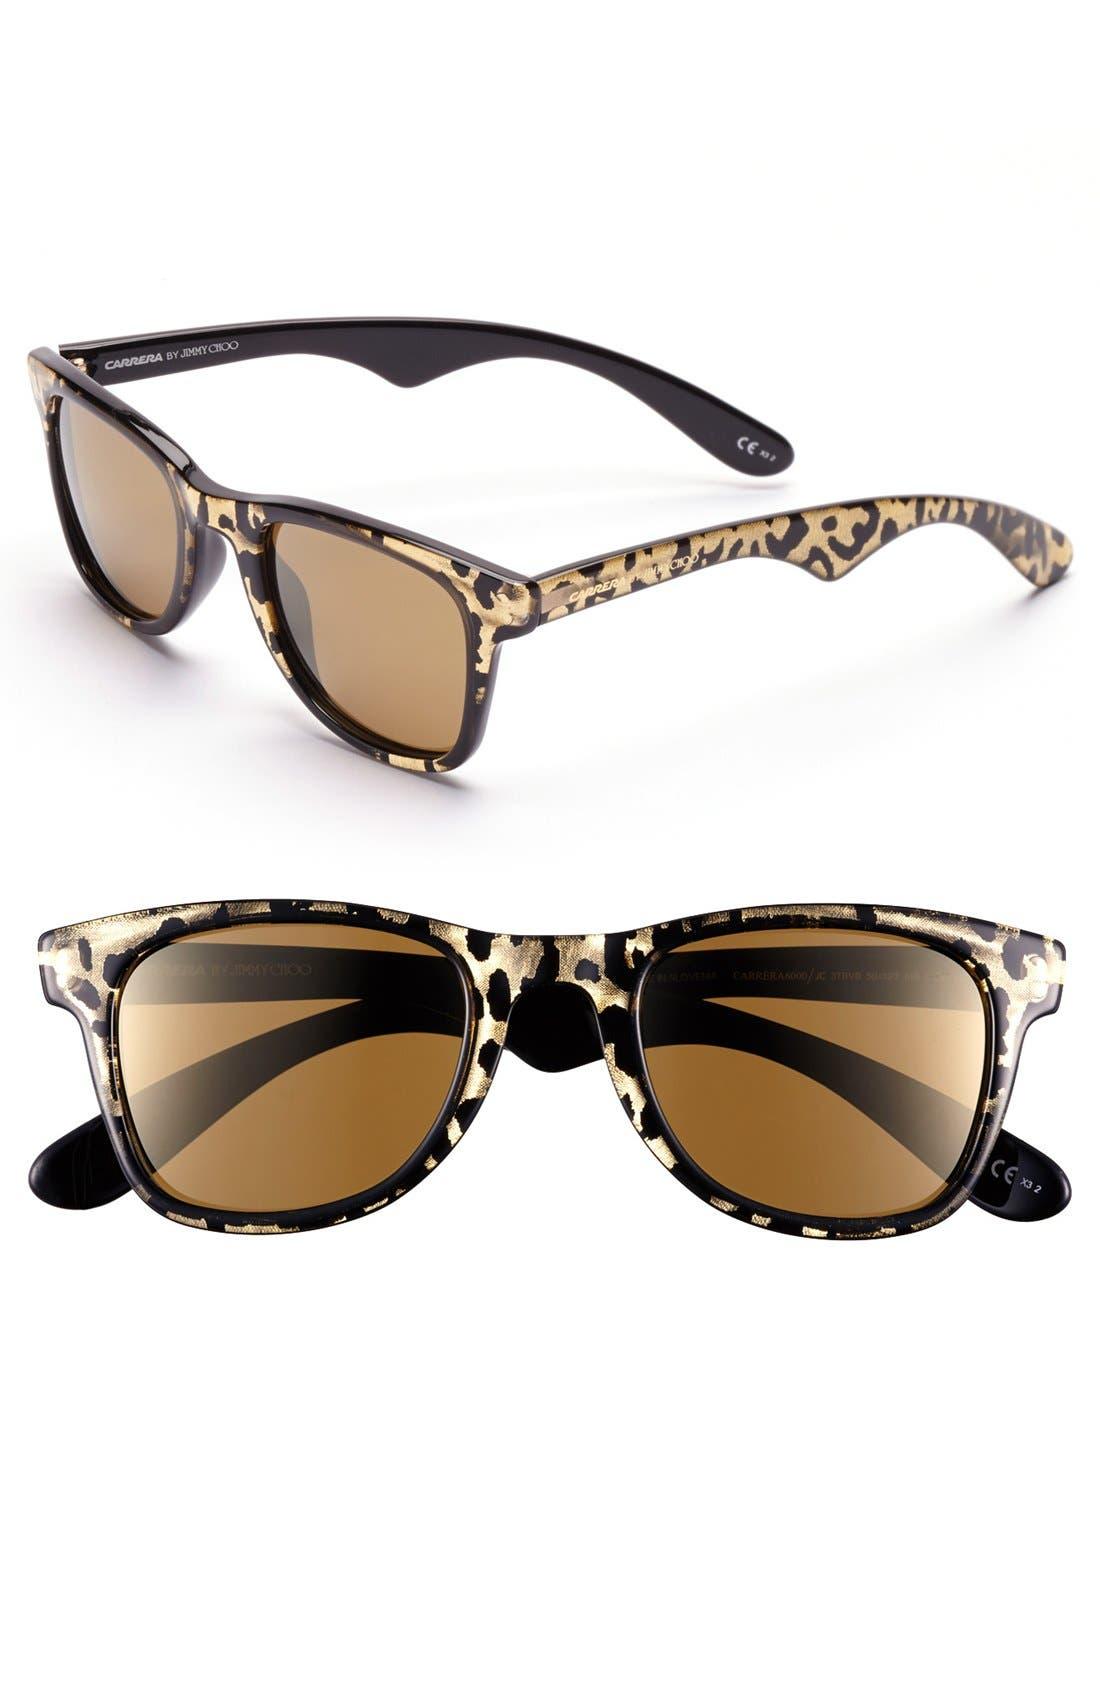 Main Image - Carrera by Jimmy Choo 50mm Sunglasses